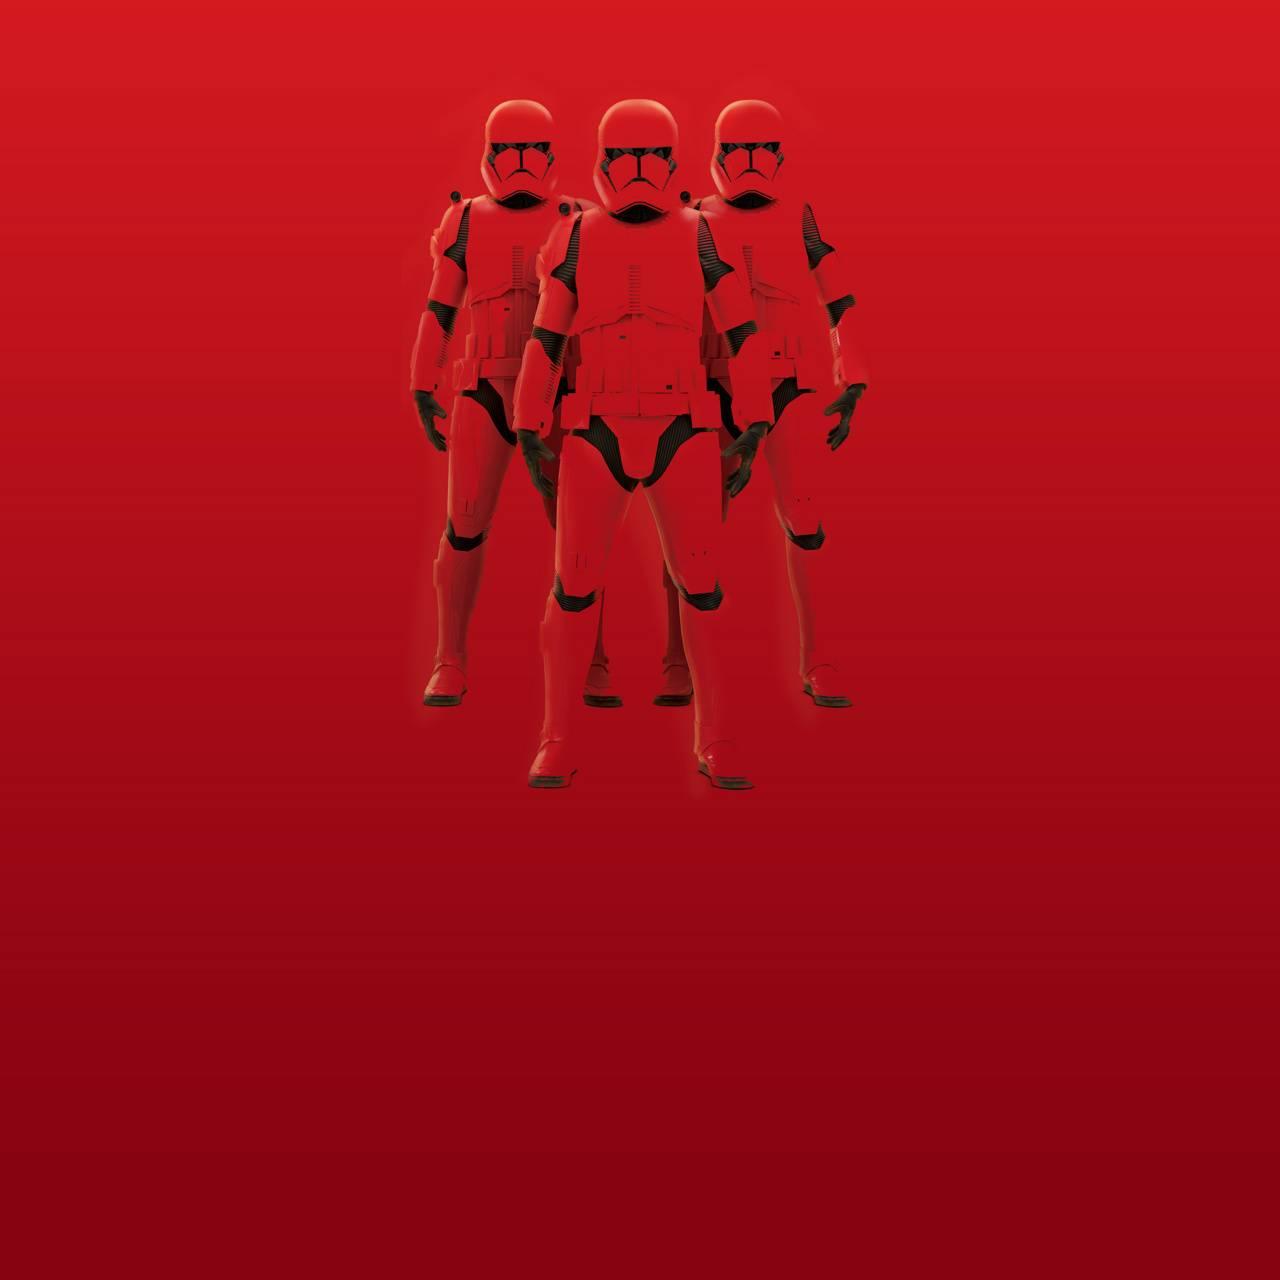 Sith Trooper Wallpaper By Jax32 75 Free On Zedge